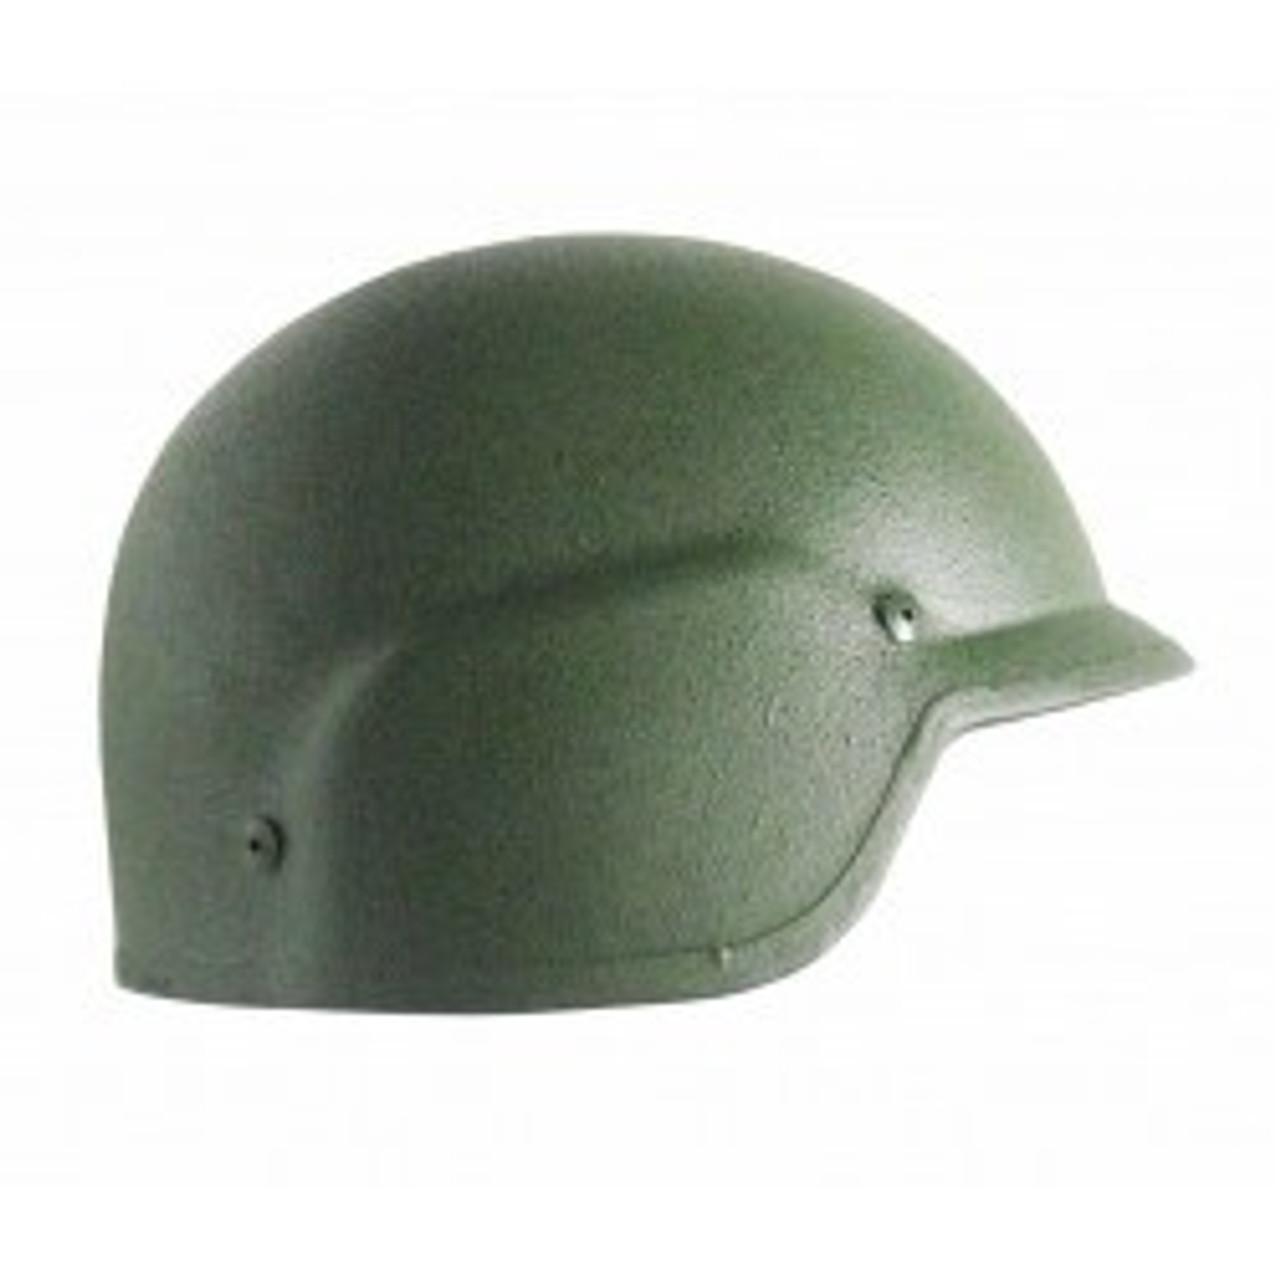 PASGT Ballistic Helmet, Green, NIJ III-A